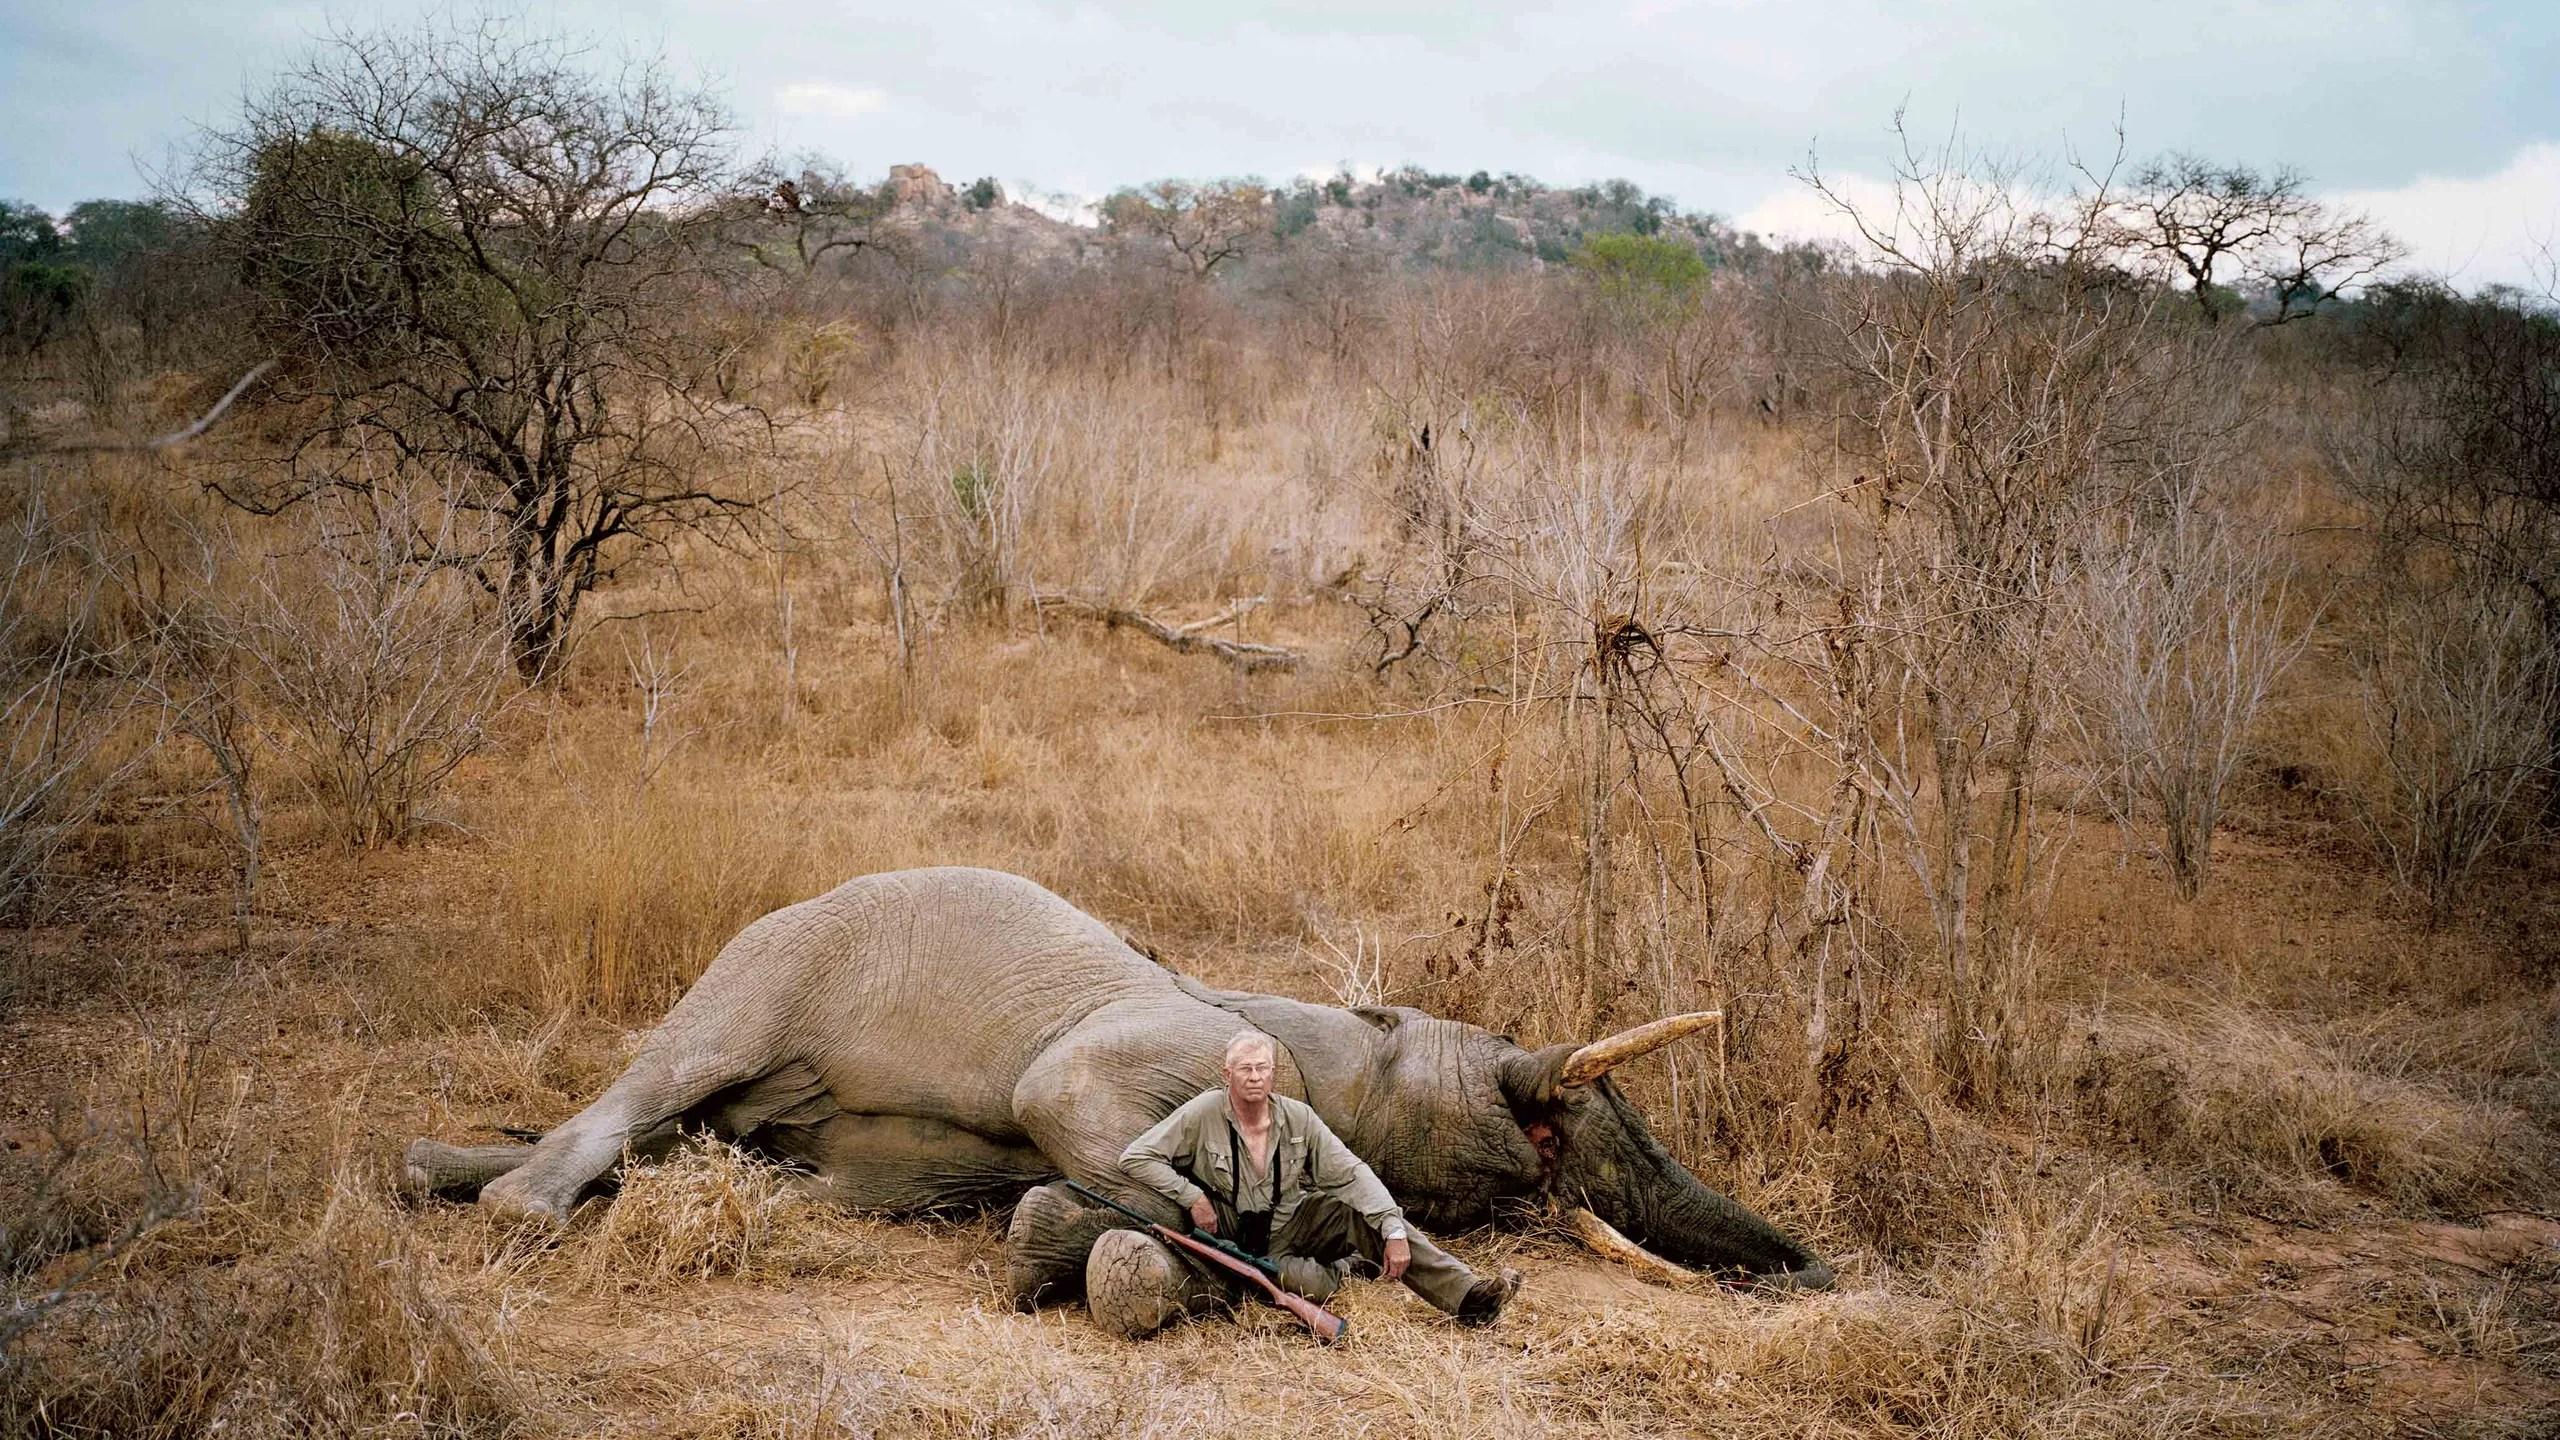 Who Wants To Shoot An Elephant